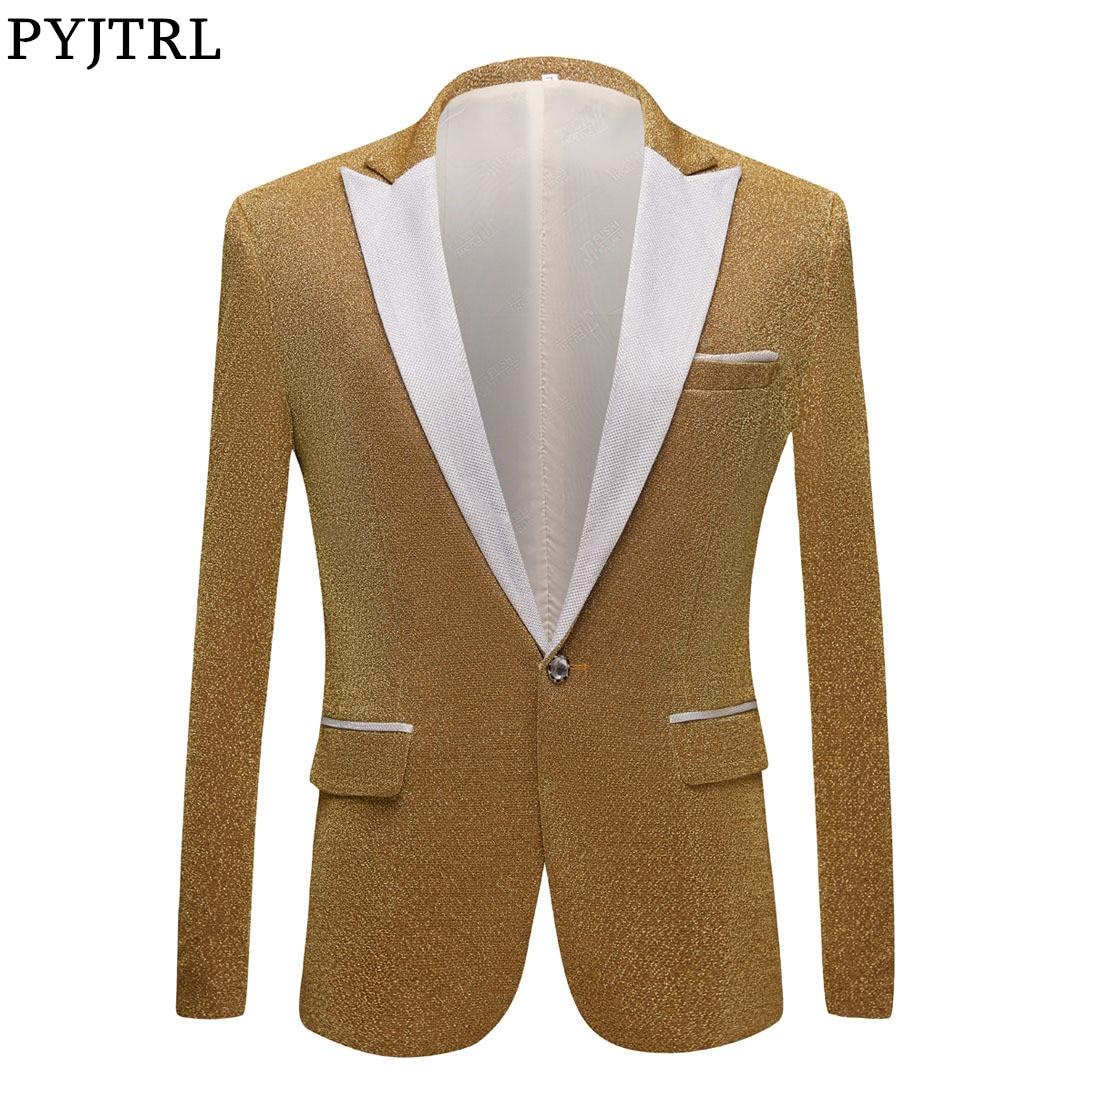 PYJTRL Men's Fashion Shiny Purple Gold Red Black Silver Gray Suit Jacket Wedding Groom Prom Singers Blazers Men Blazer Slim Fit